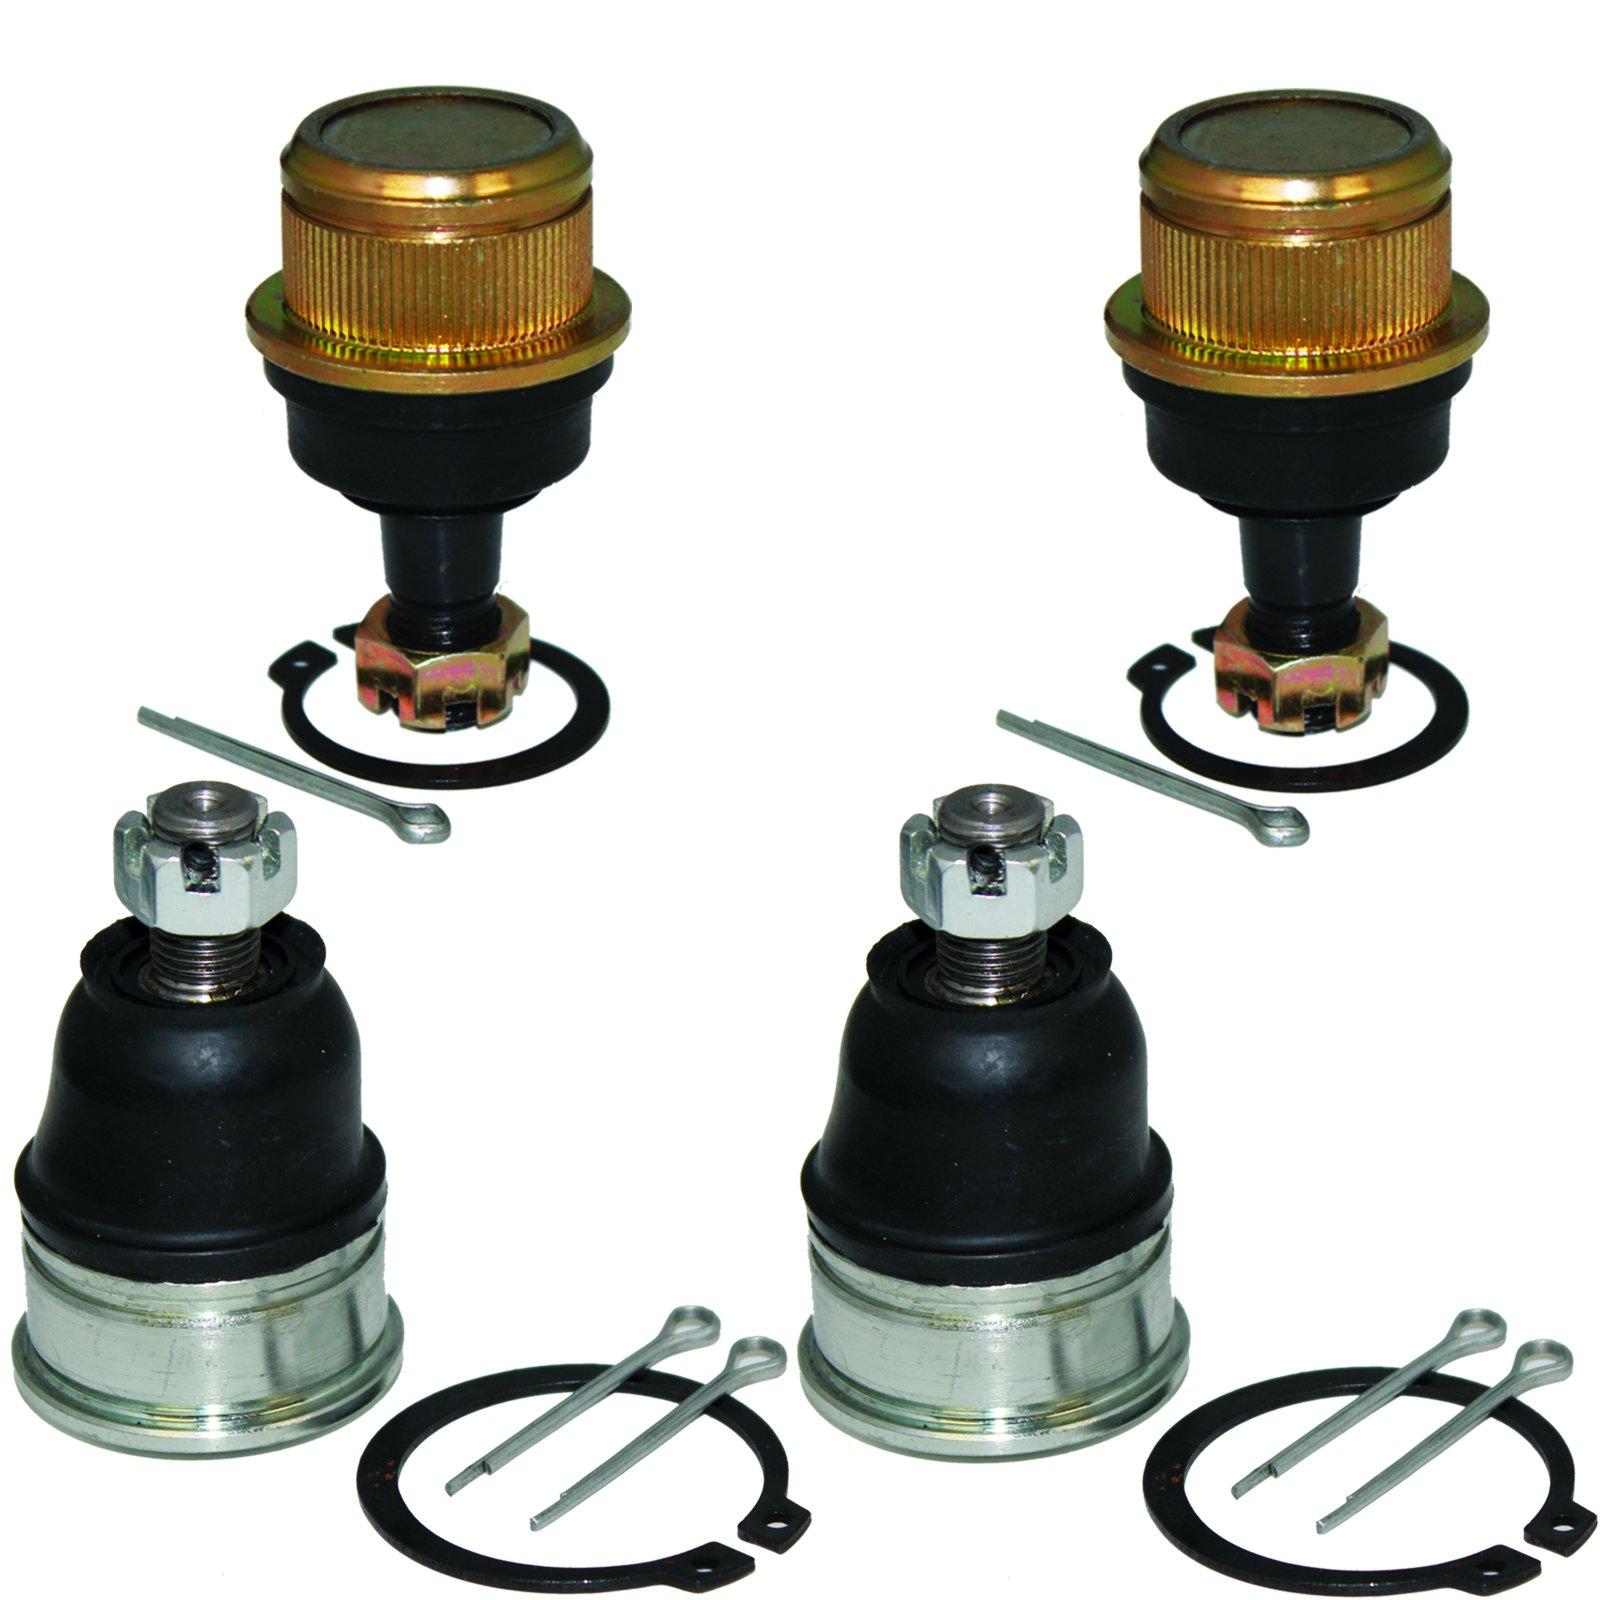 Caltric 4 UPPER & LOWER A-ARM BALL JOINT Fits HONDA TRX250EX TRX-250EX SPORTRAX 250 2001-2008